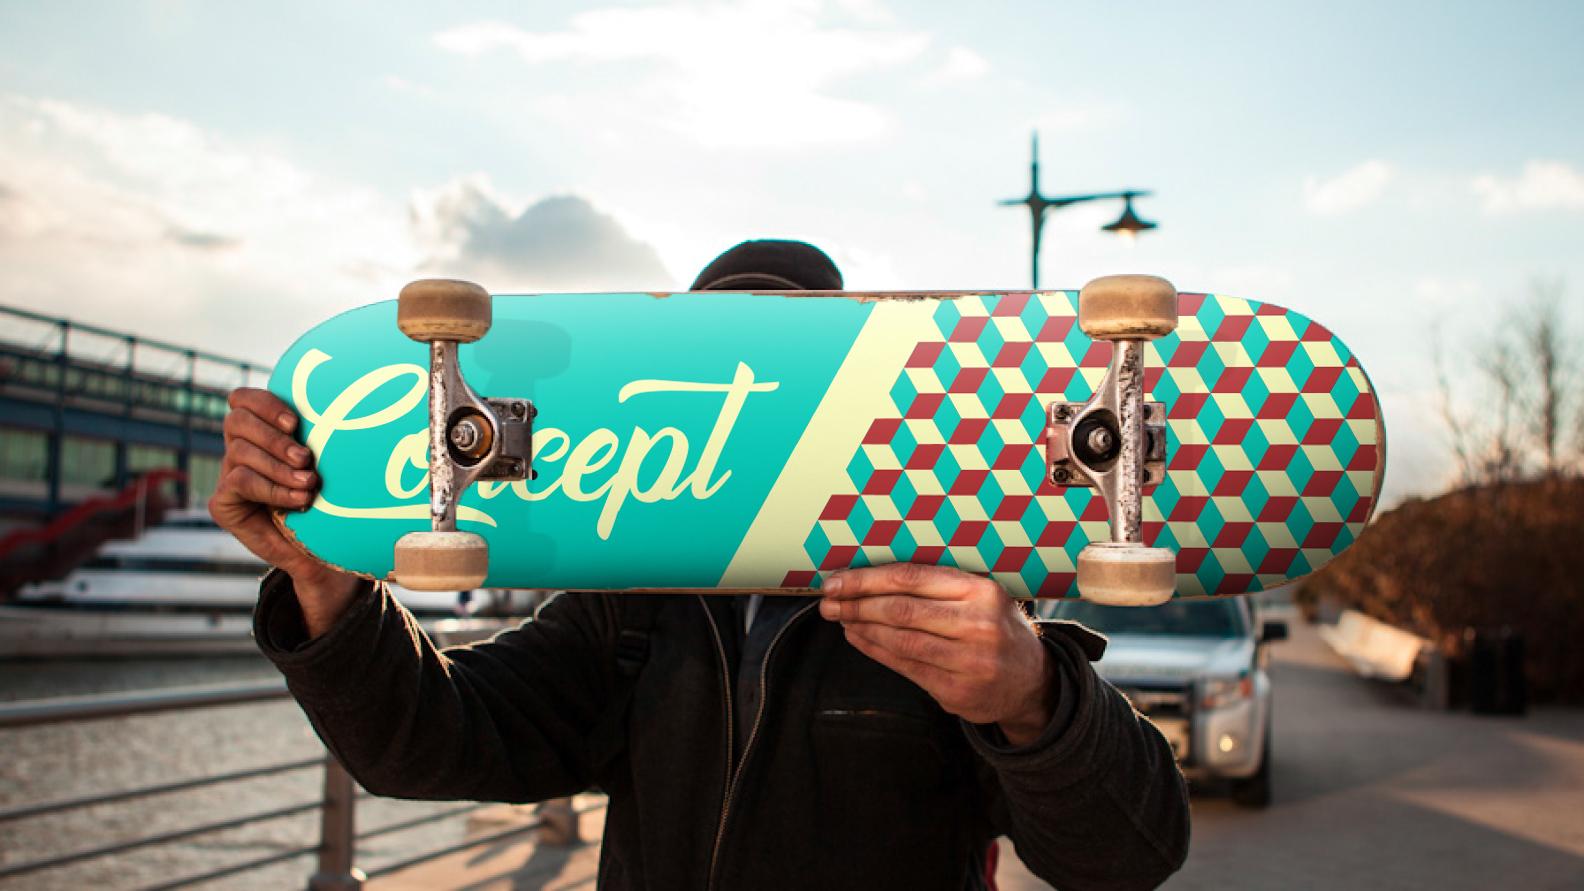 skateboard_image_replace6.jpg